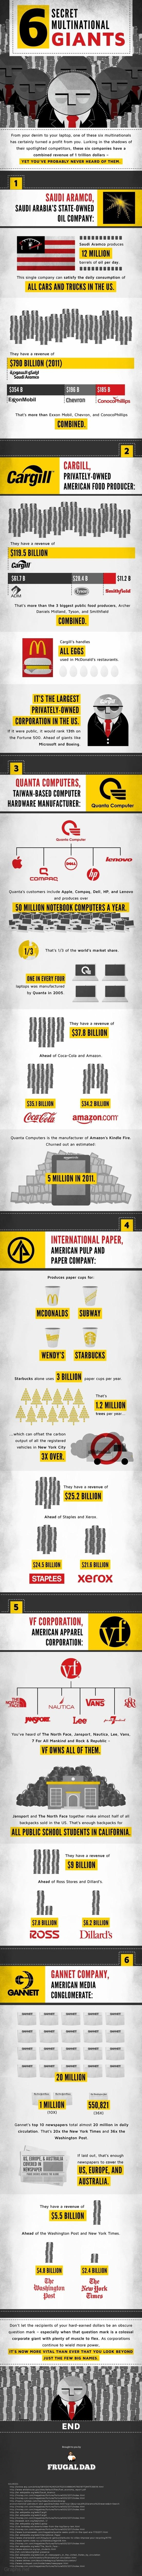 Top 6 Secret Companies That Make Huge Revenue